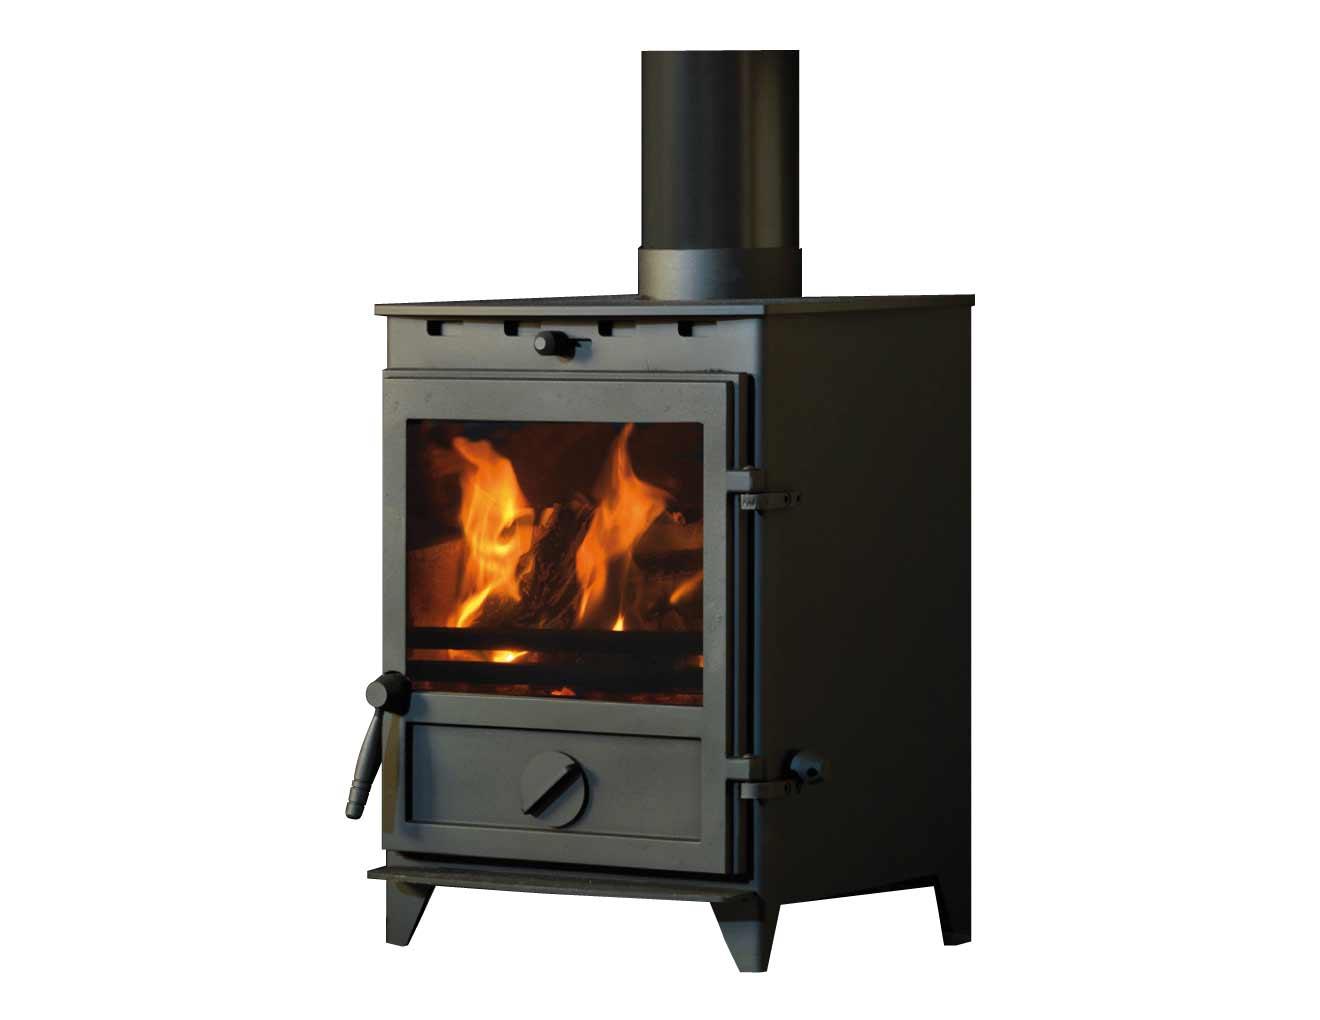 fireline steel multi fuel stove heat design. Black Bedroom Furniture Sets. Home Design Ideas